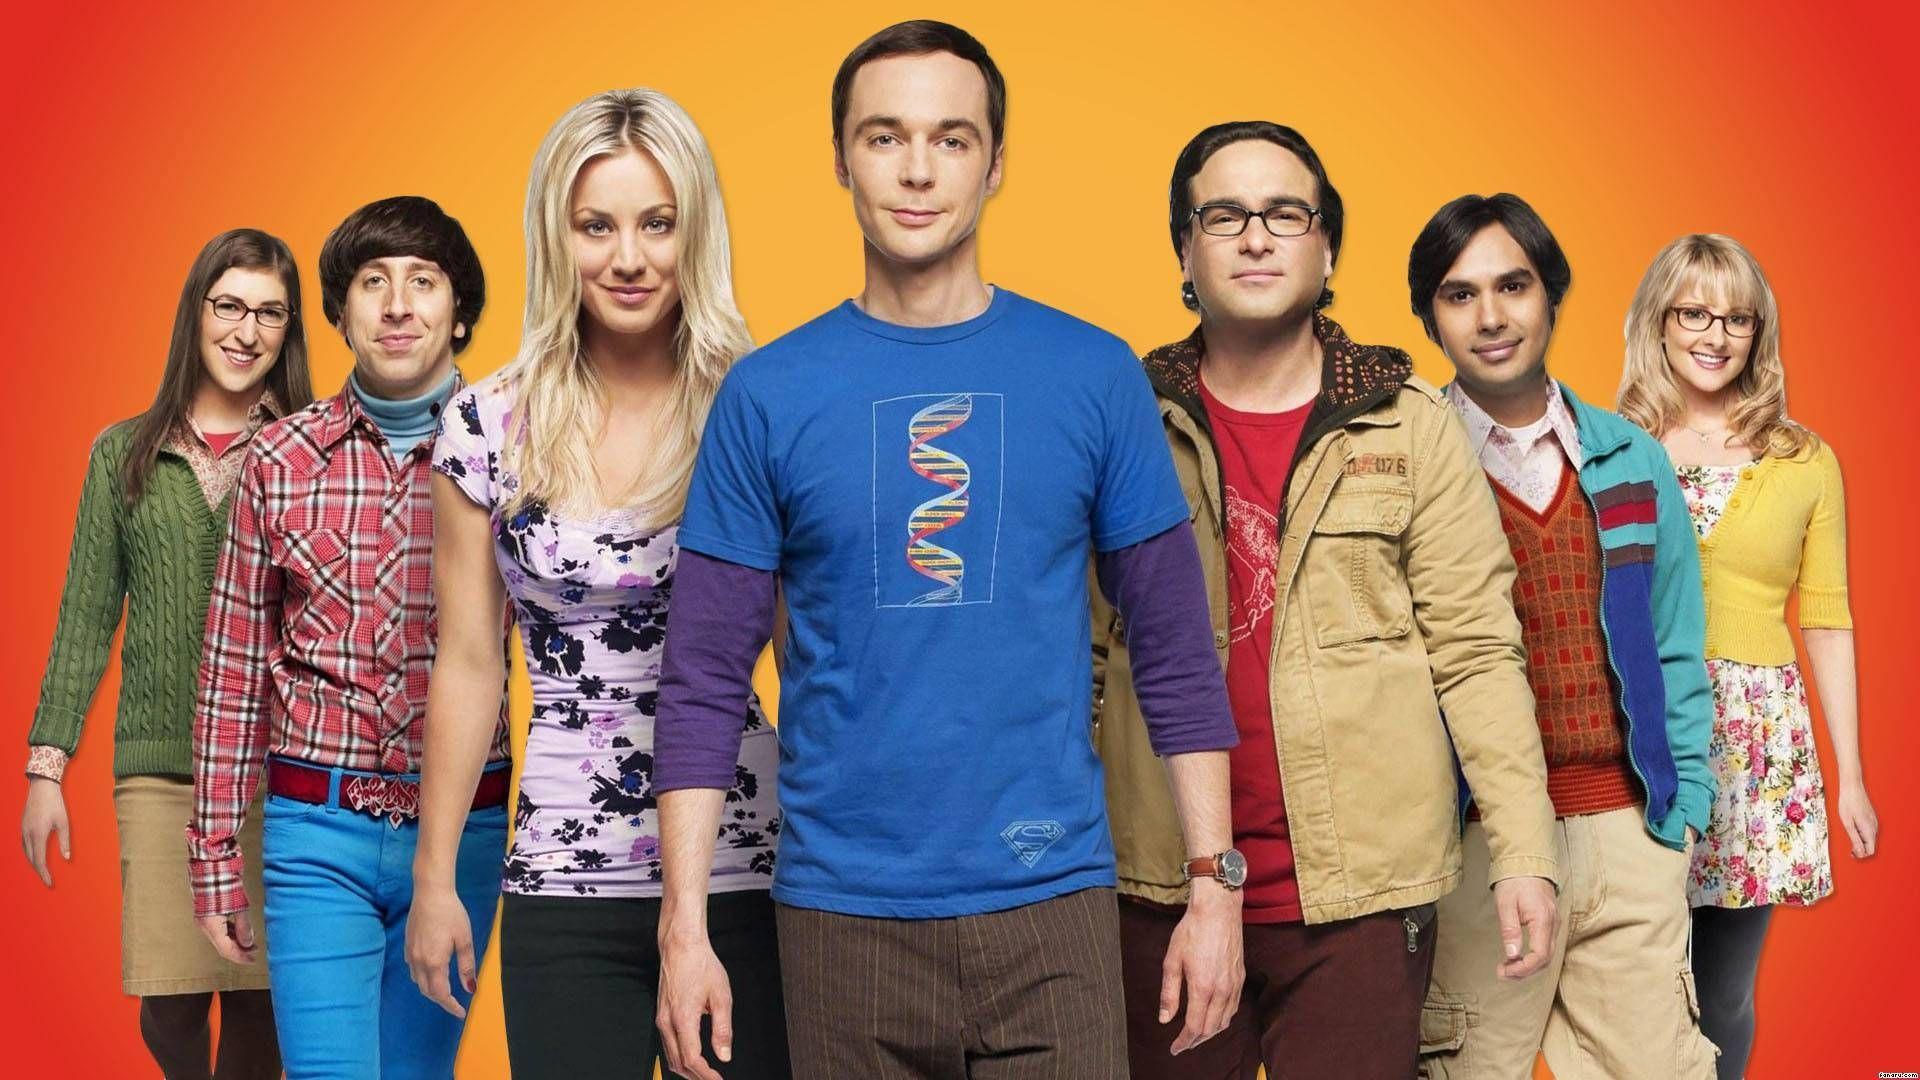 593 - ¿A qué personaje de The Big Bang Theory te pareces?